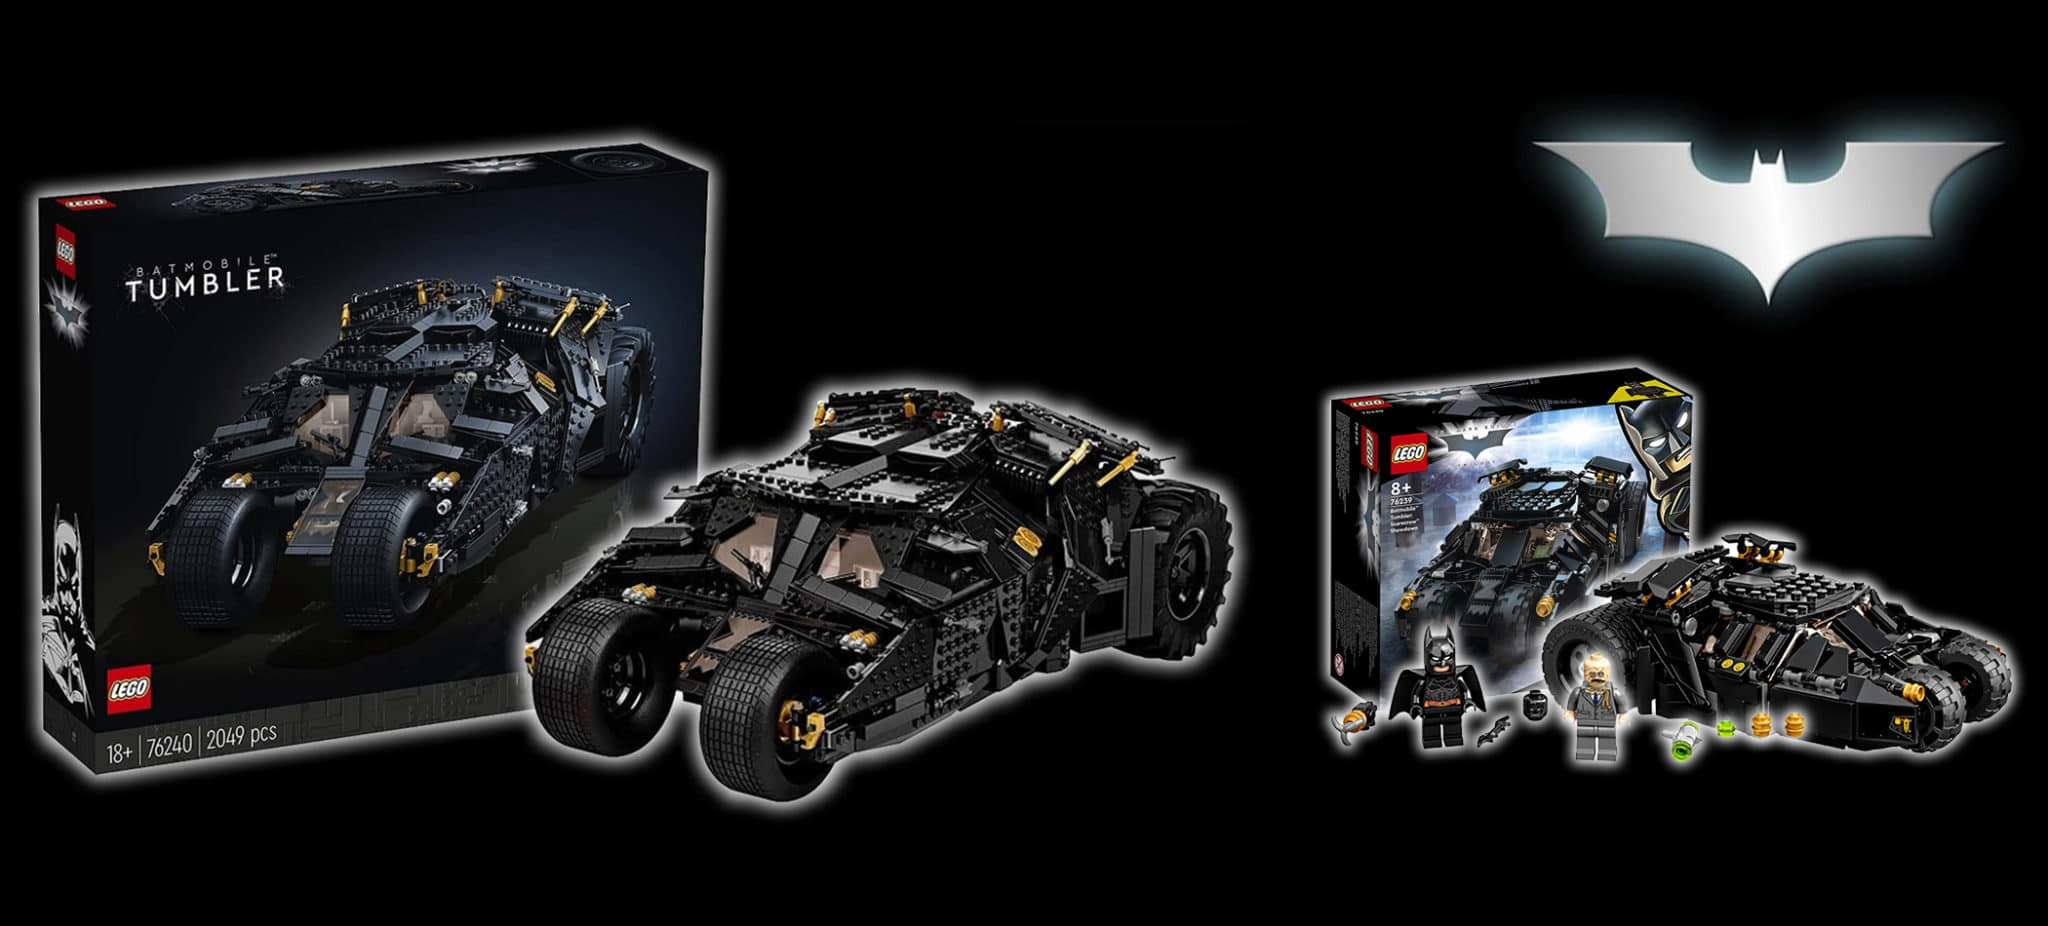 Jb Spielwaren Aktion Batman Tumbler 2